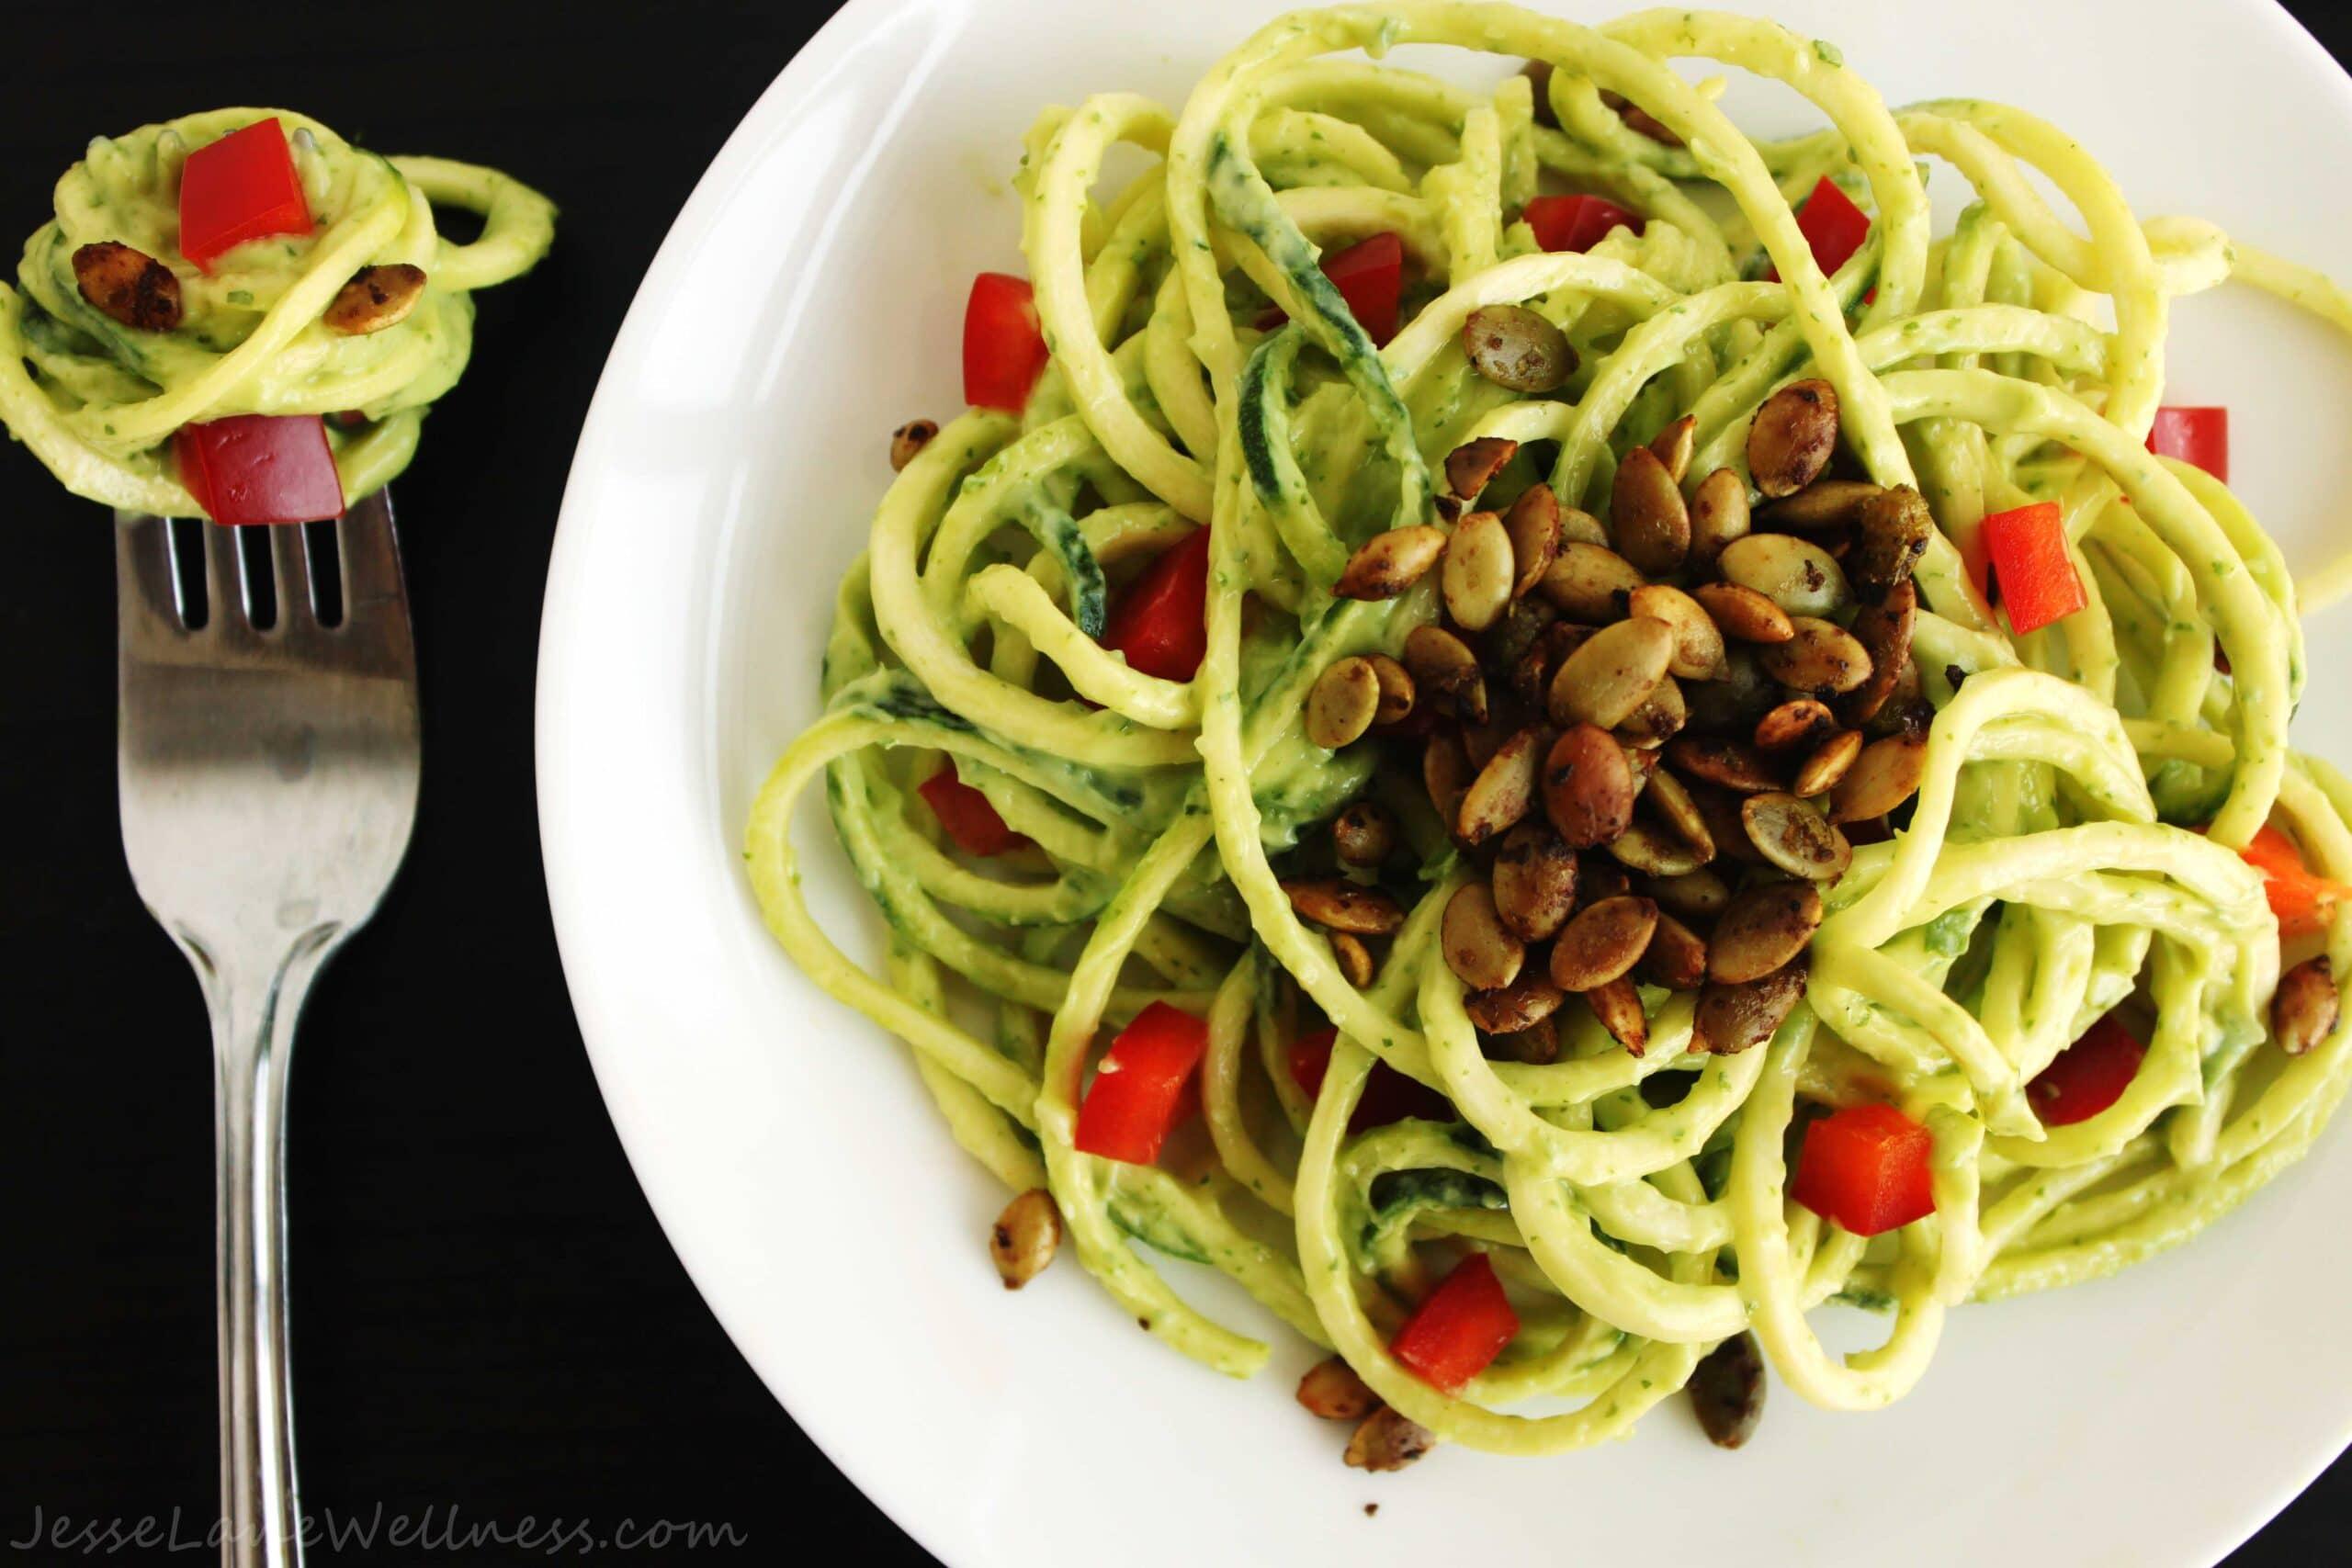 Summer Cilantro Zucchini Pasta by @JesseLWellness #glutenfree